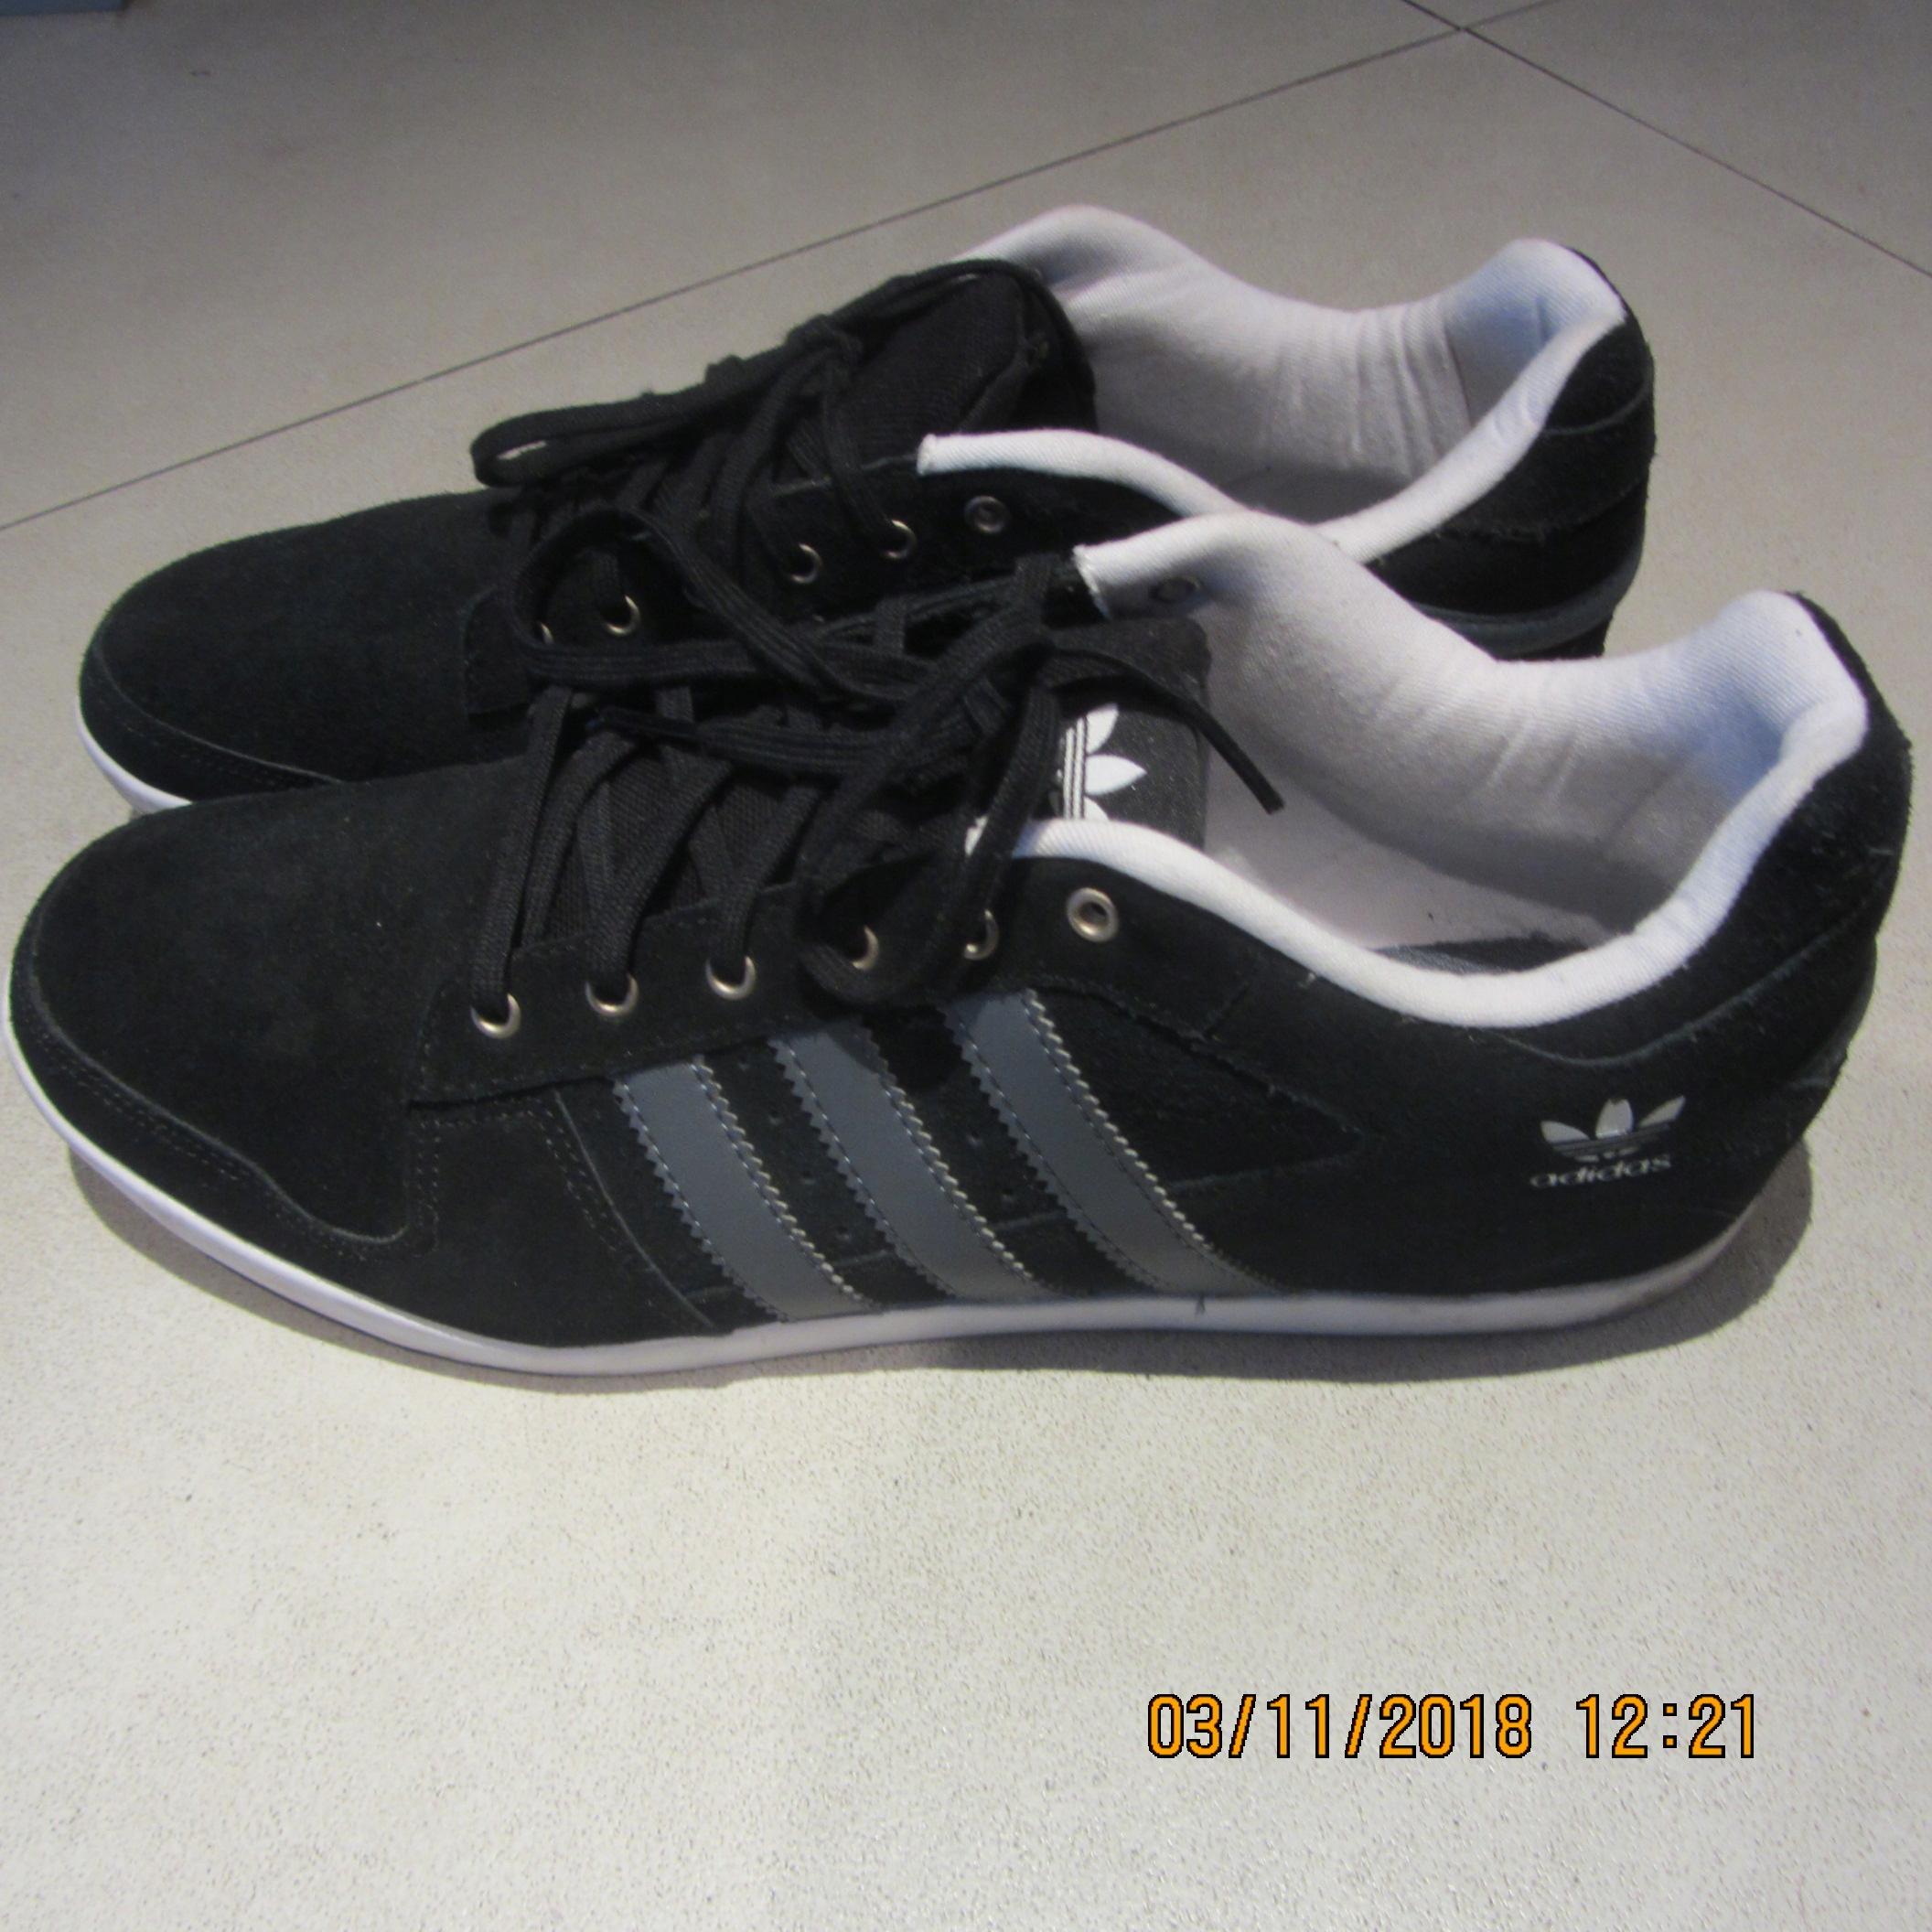 Adidas buty ADIDAS PLIMCANA 2.0 LOW B44001 44 7652215123